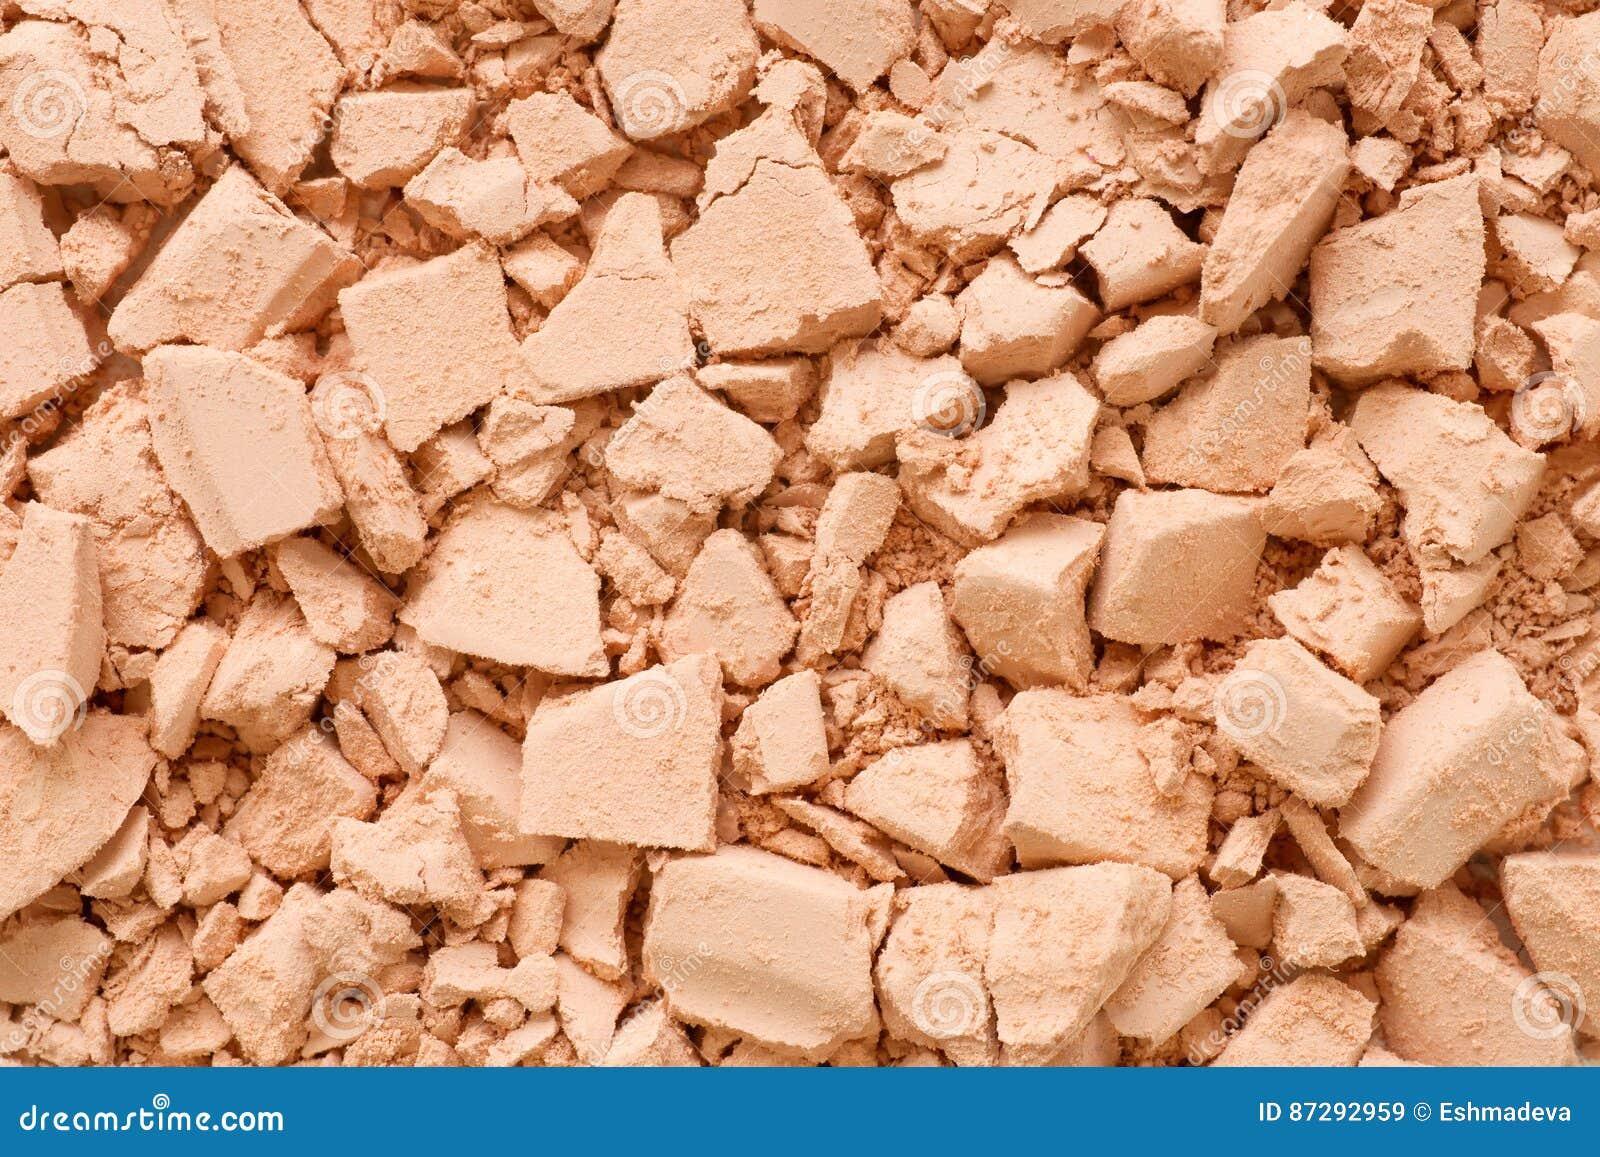 Crushed powder extremal close up